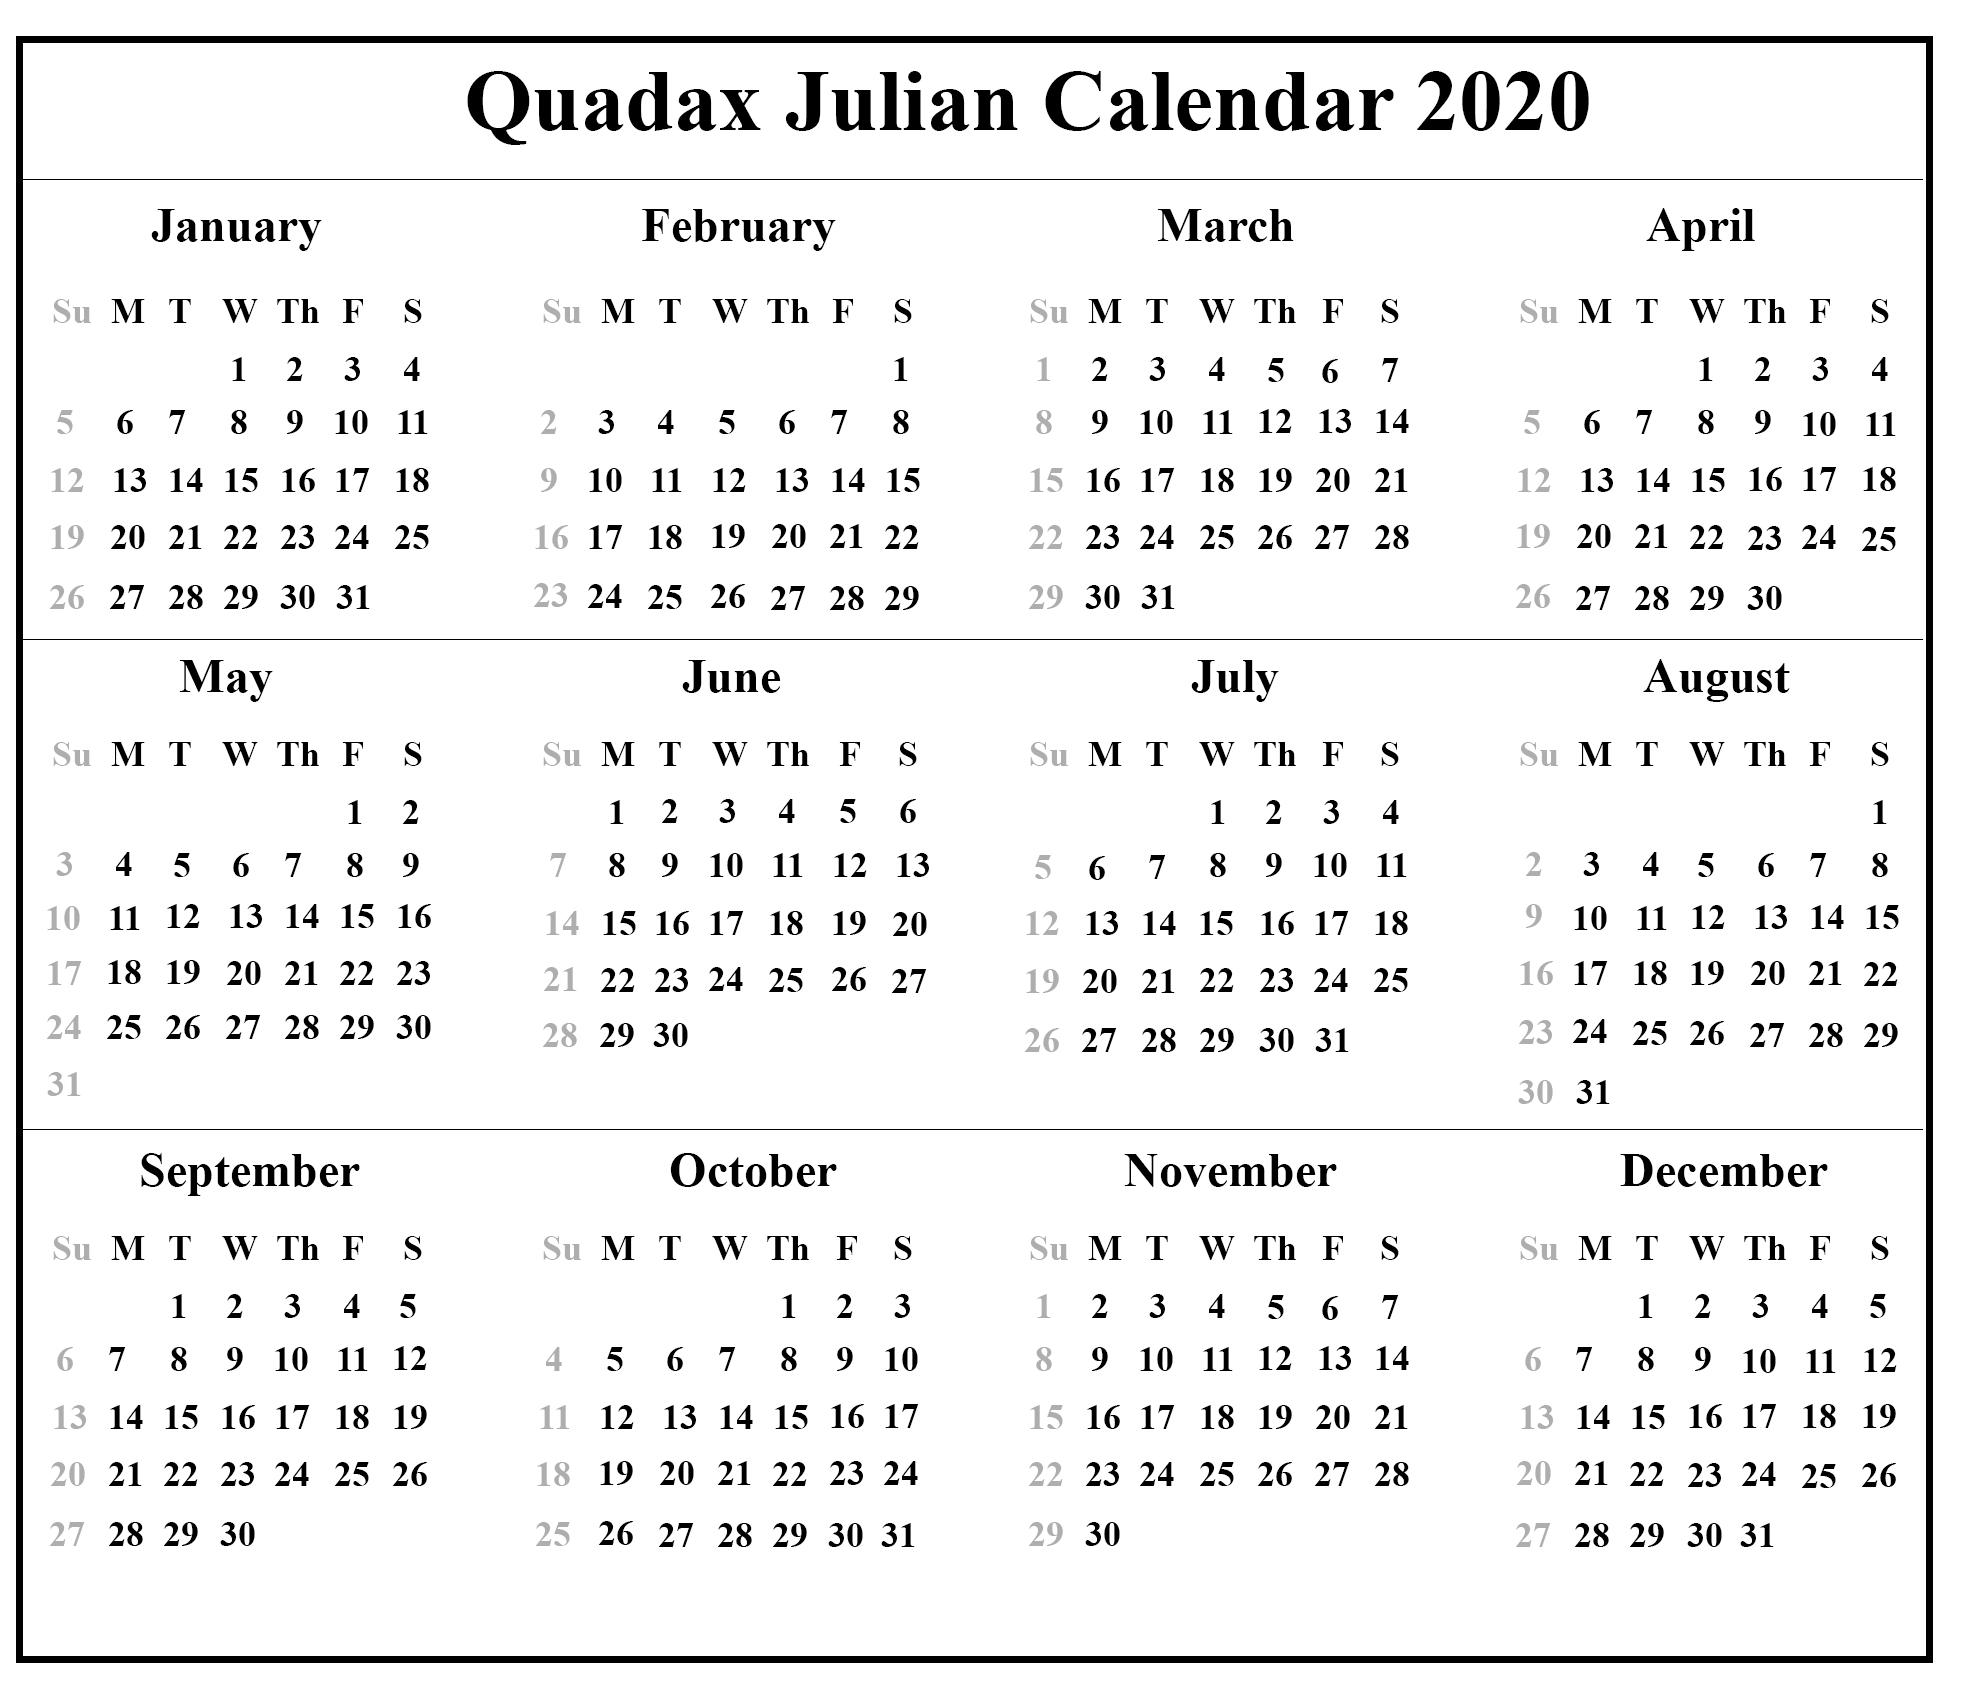 Julian Calendar 2020 Pdf Quadax | Example Calendar Printable intended for Quadax Julian Calendar 2020